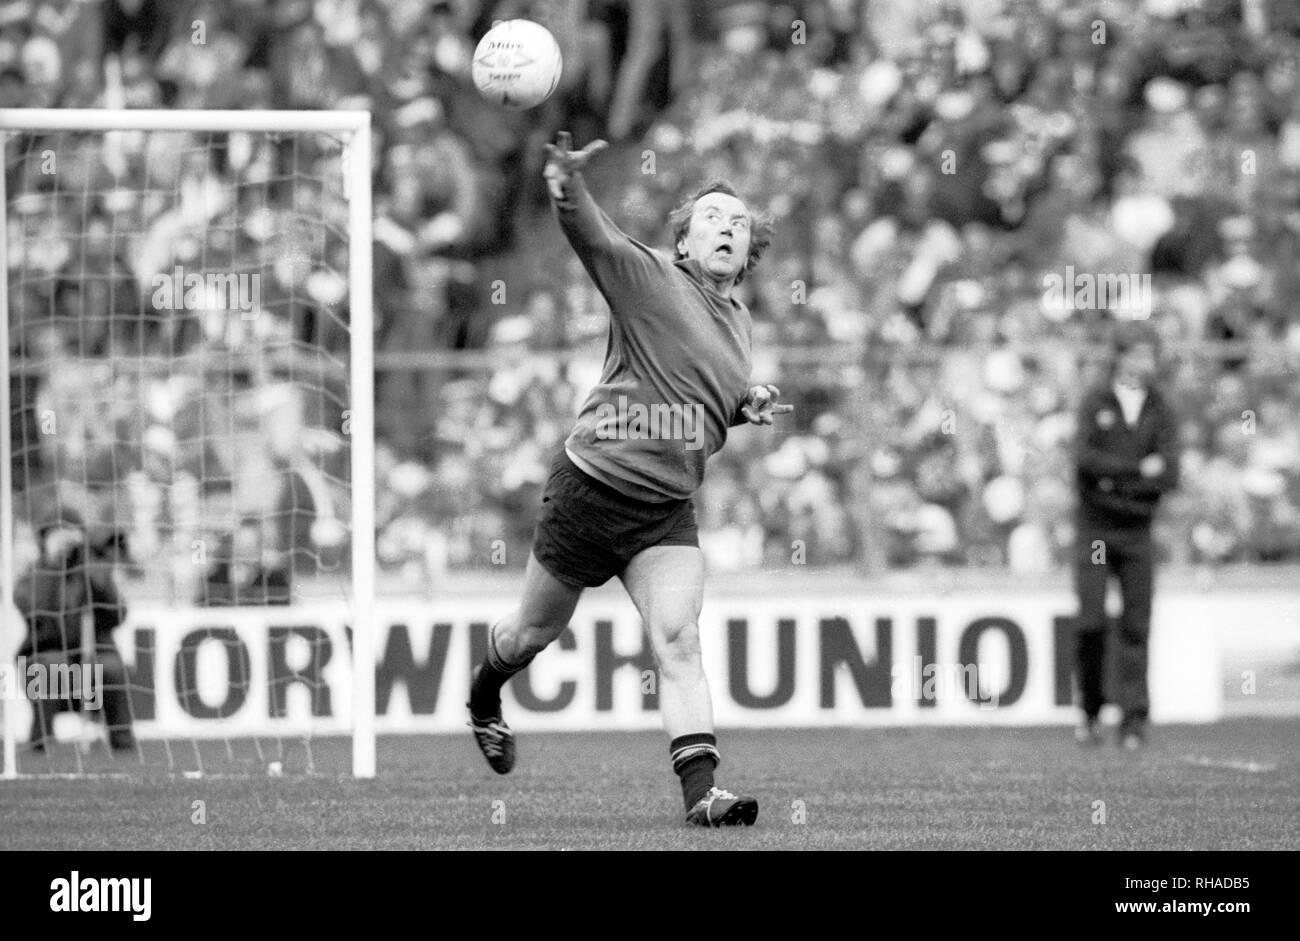 1986 Football Stock Photos & 1986 Football Stock Images - Alamy